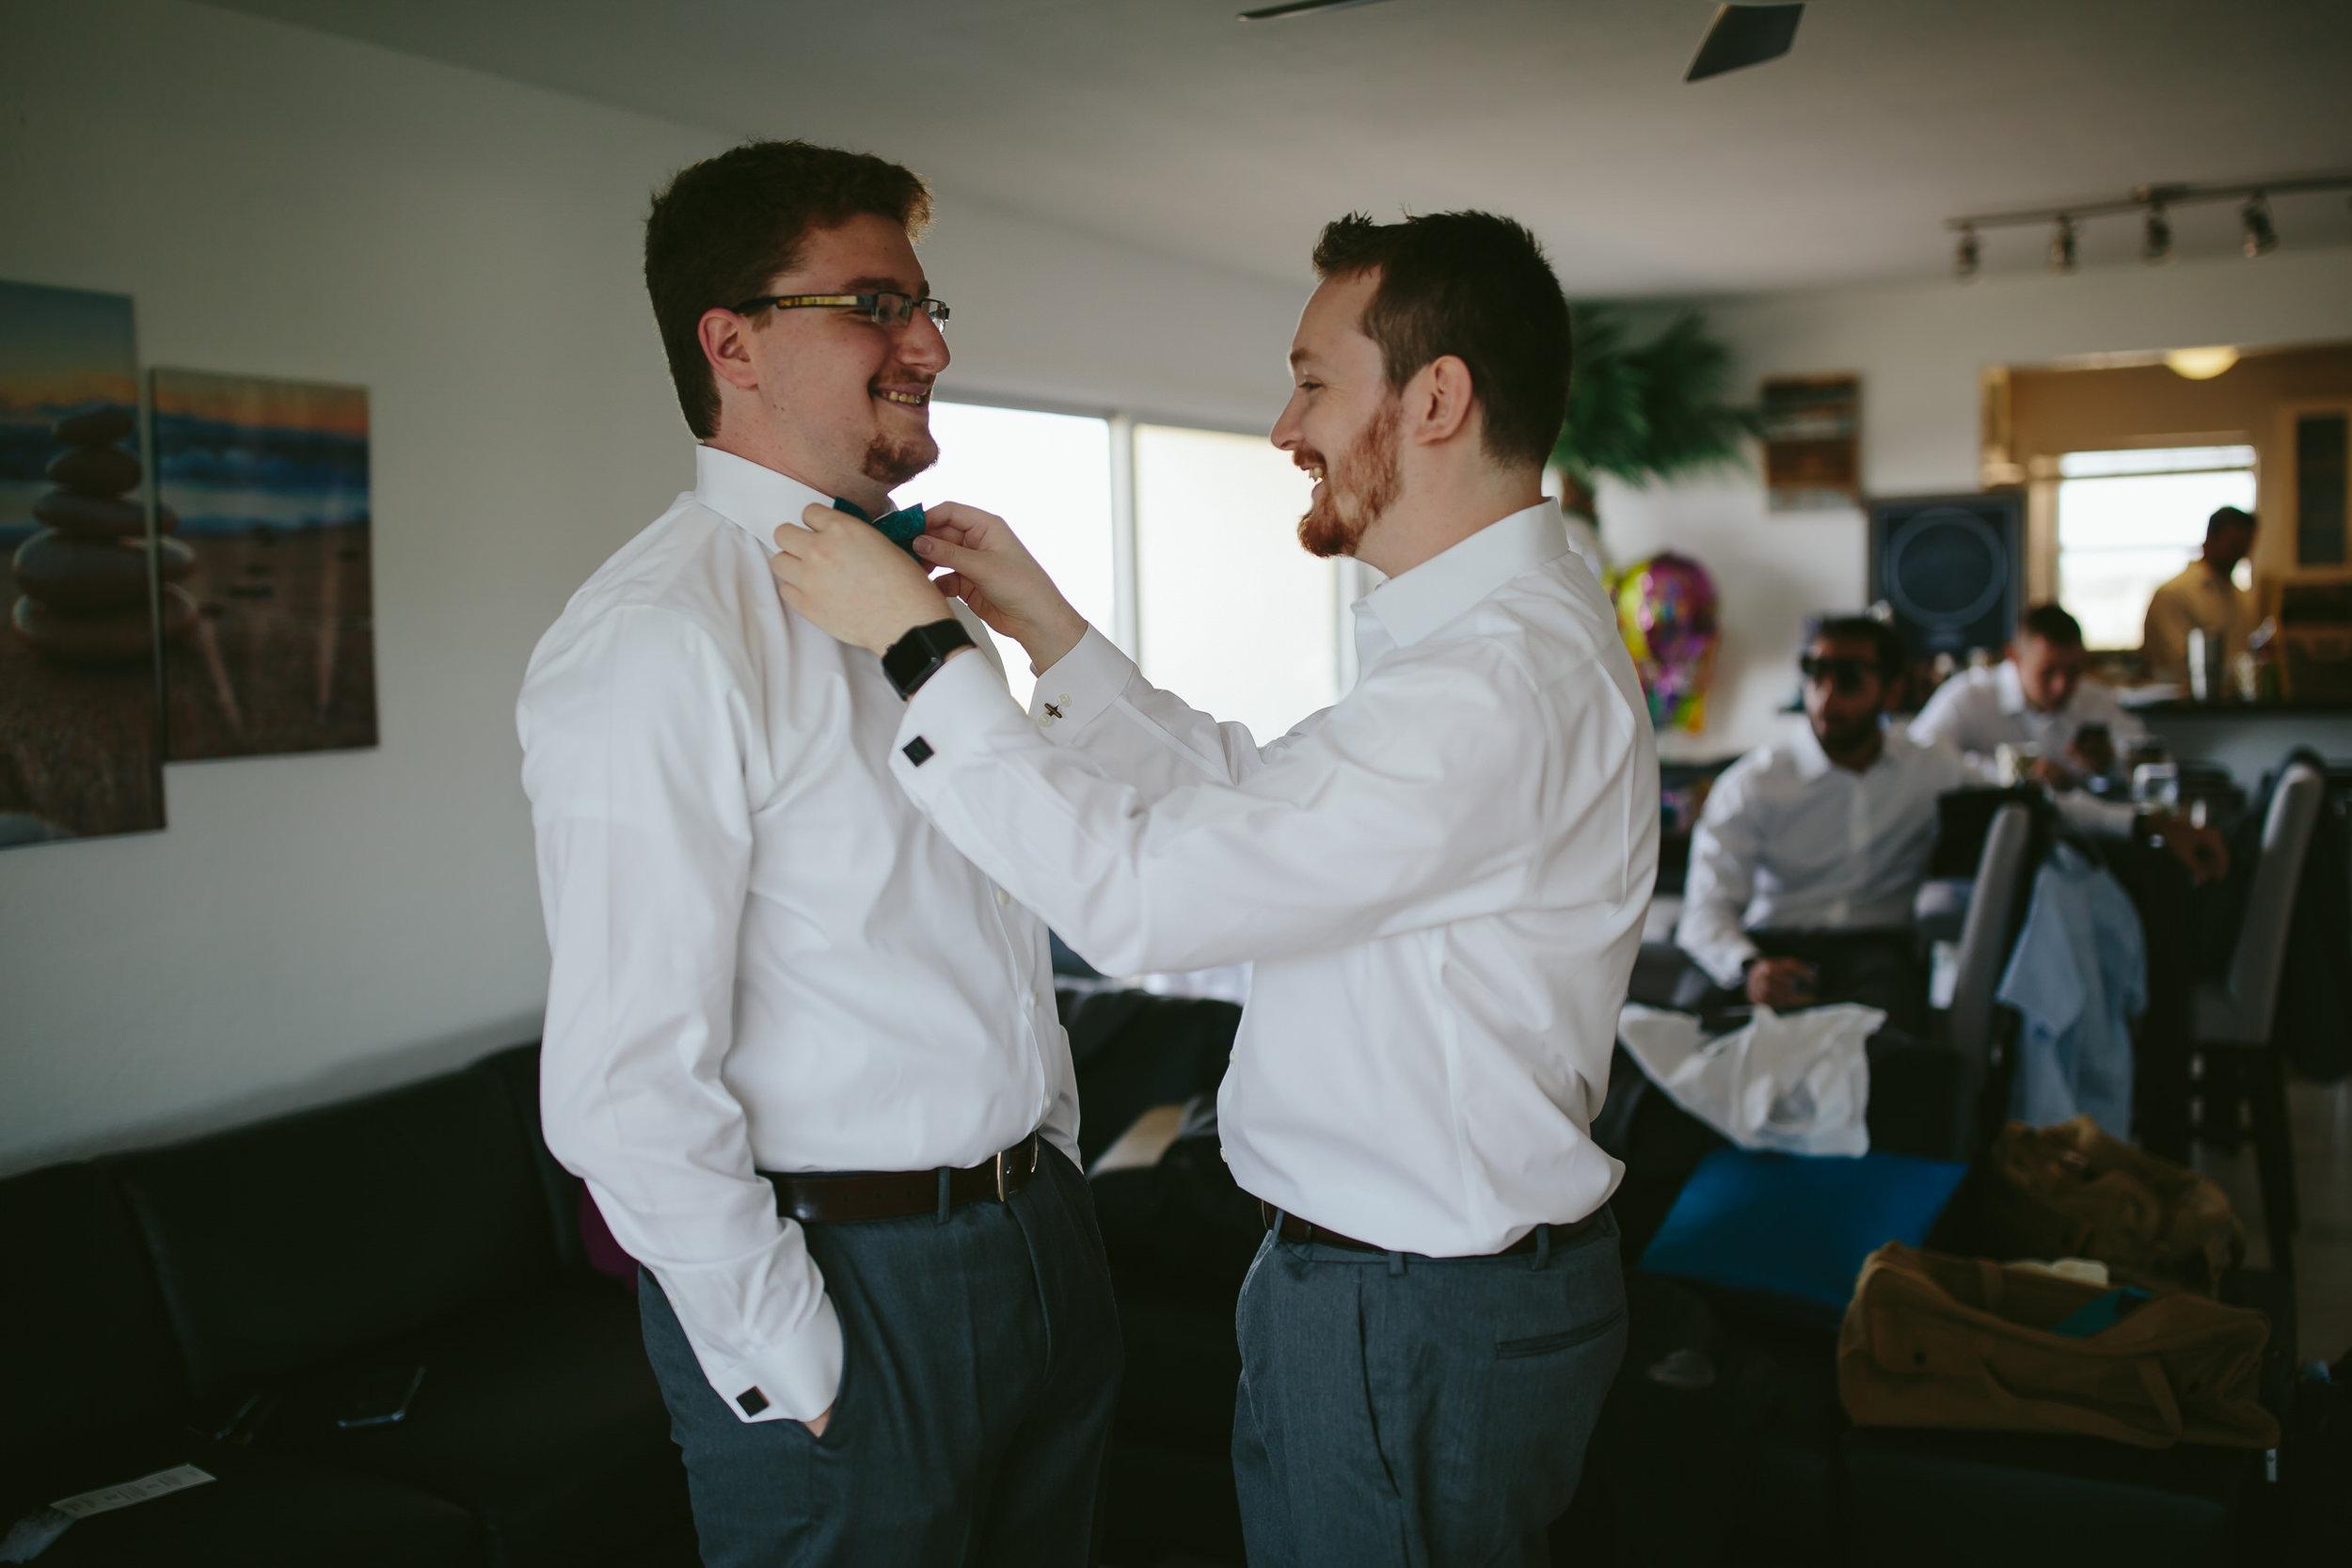 groom_getting_ready_detail_steph_lynn_photo_lighthouse_point_yacht_club_wedding-21.jpg